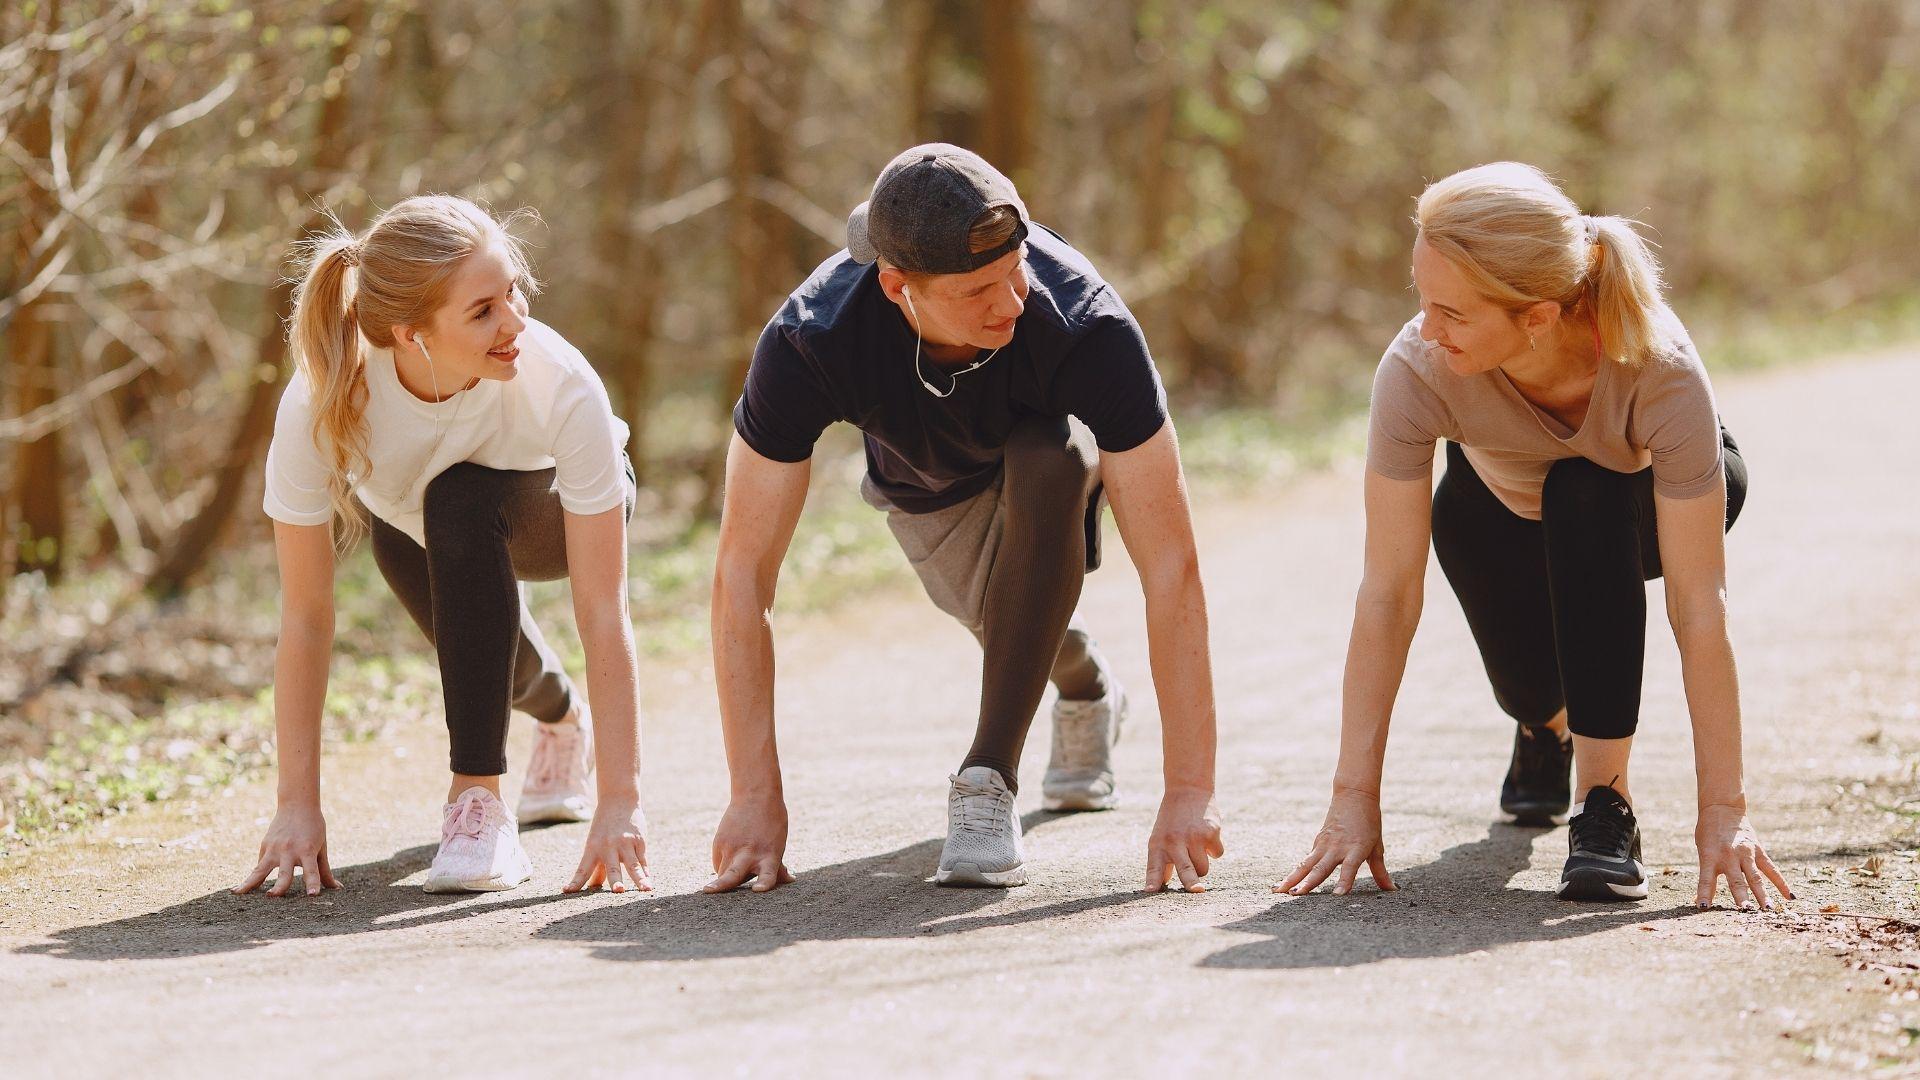 Joggen anfangen mit Freunden oder Laufgruppe